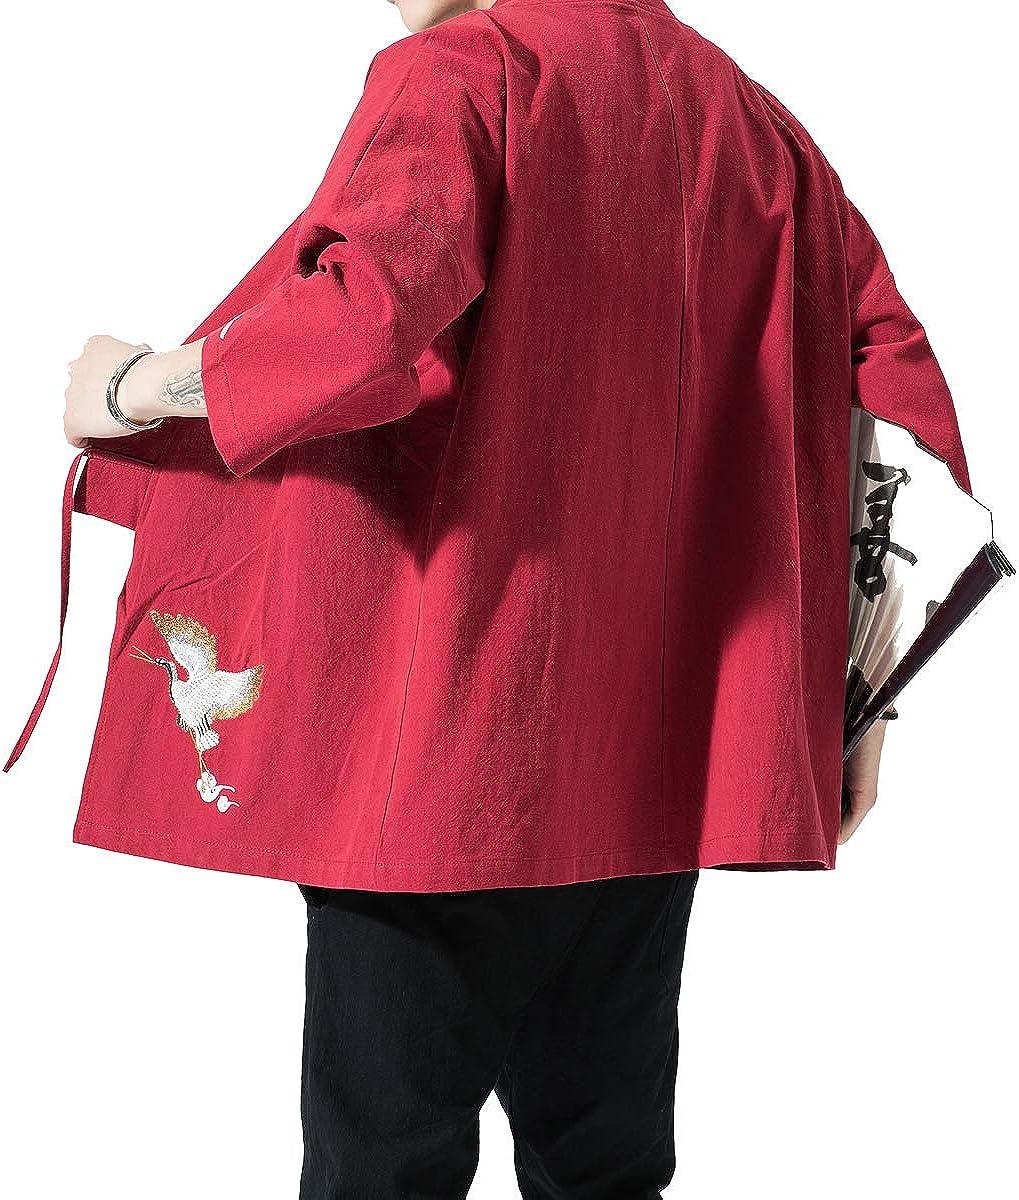 PRIJOUHE Mens Japanese Fashion Kimono Cardigan Plus Size Jacket Yukata Casual Cotton Linen Seven Sleeve Lightweight